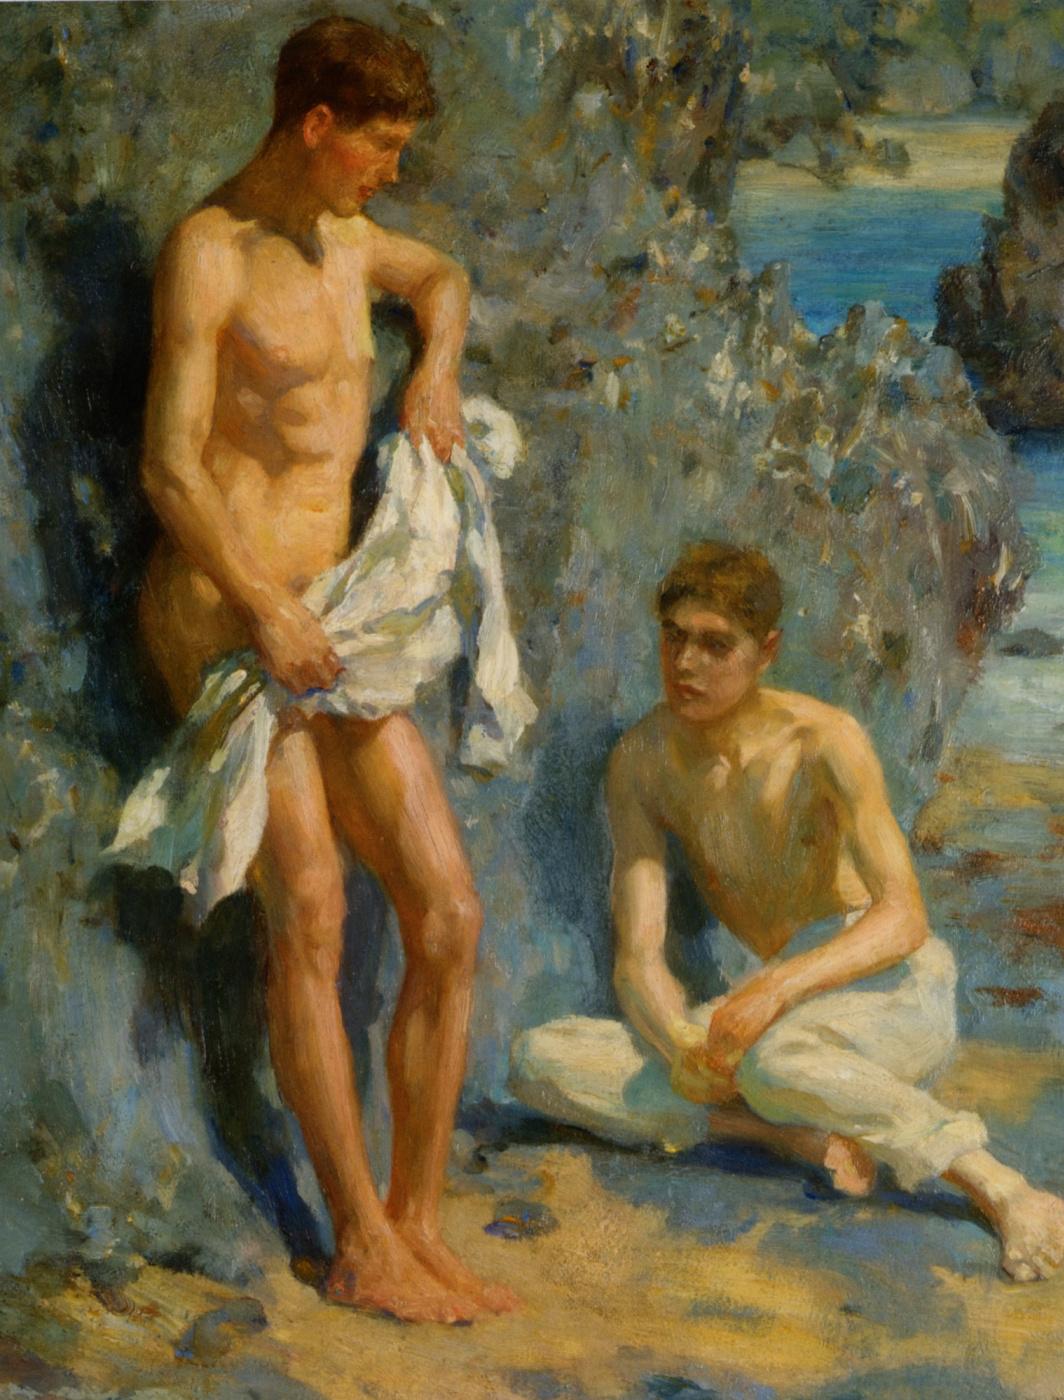 Tuke Henry Scott. 1858-1929. After the bathers, 1921